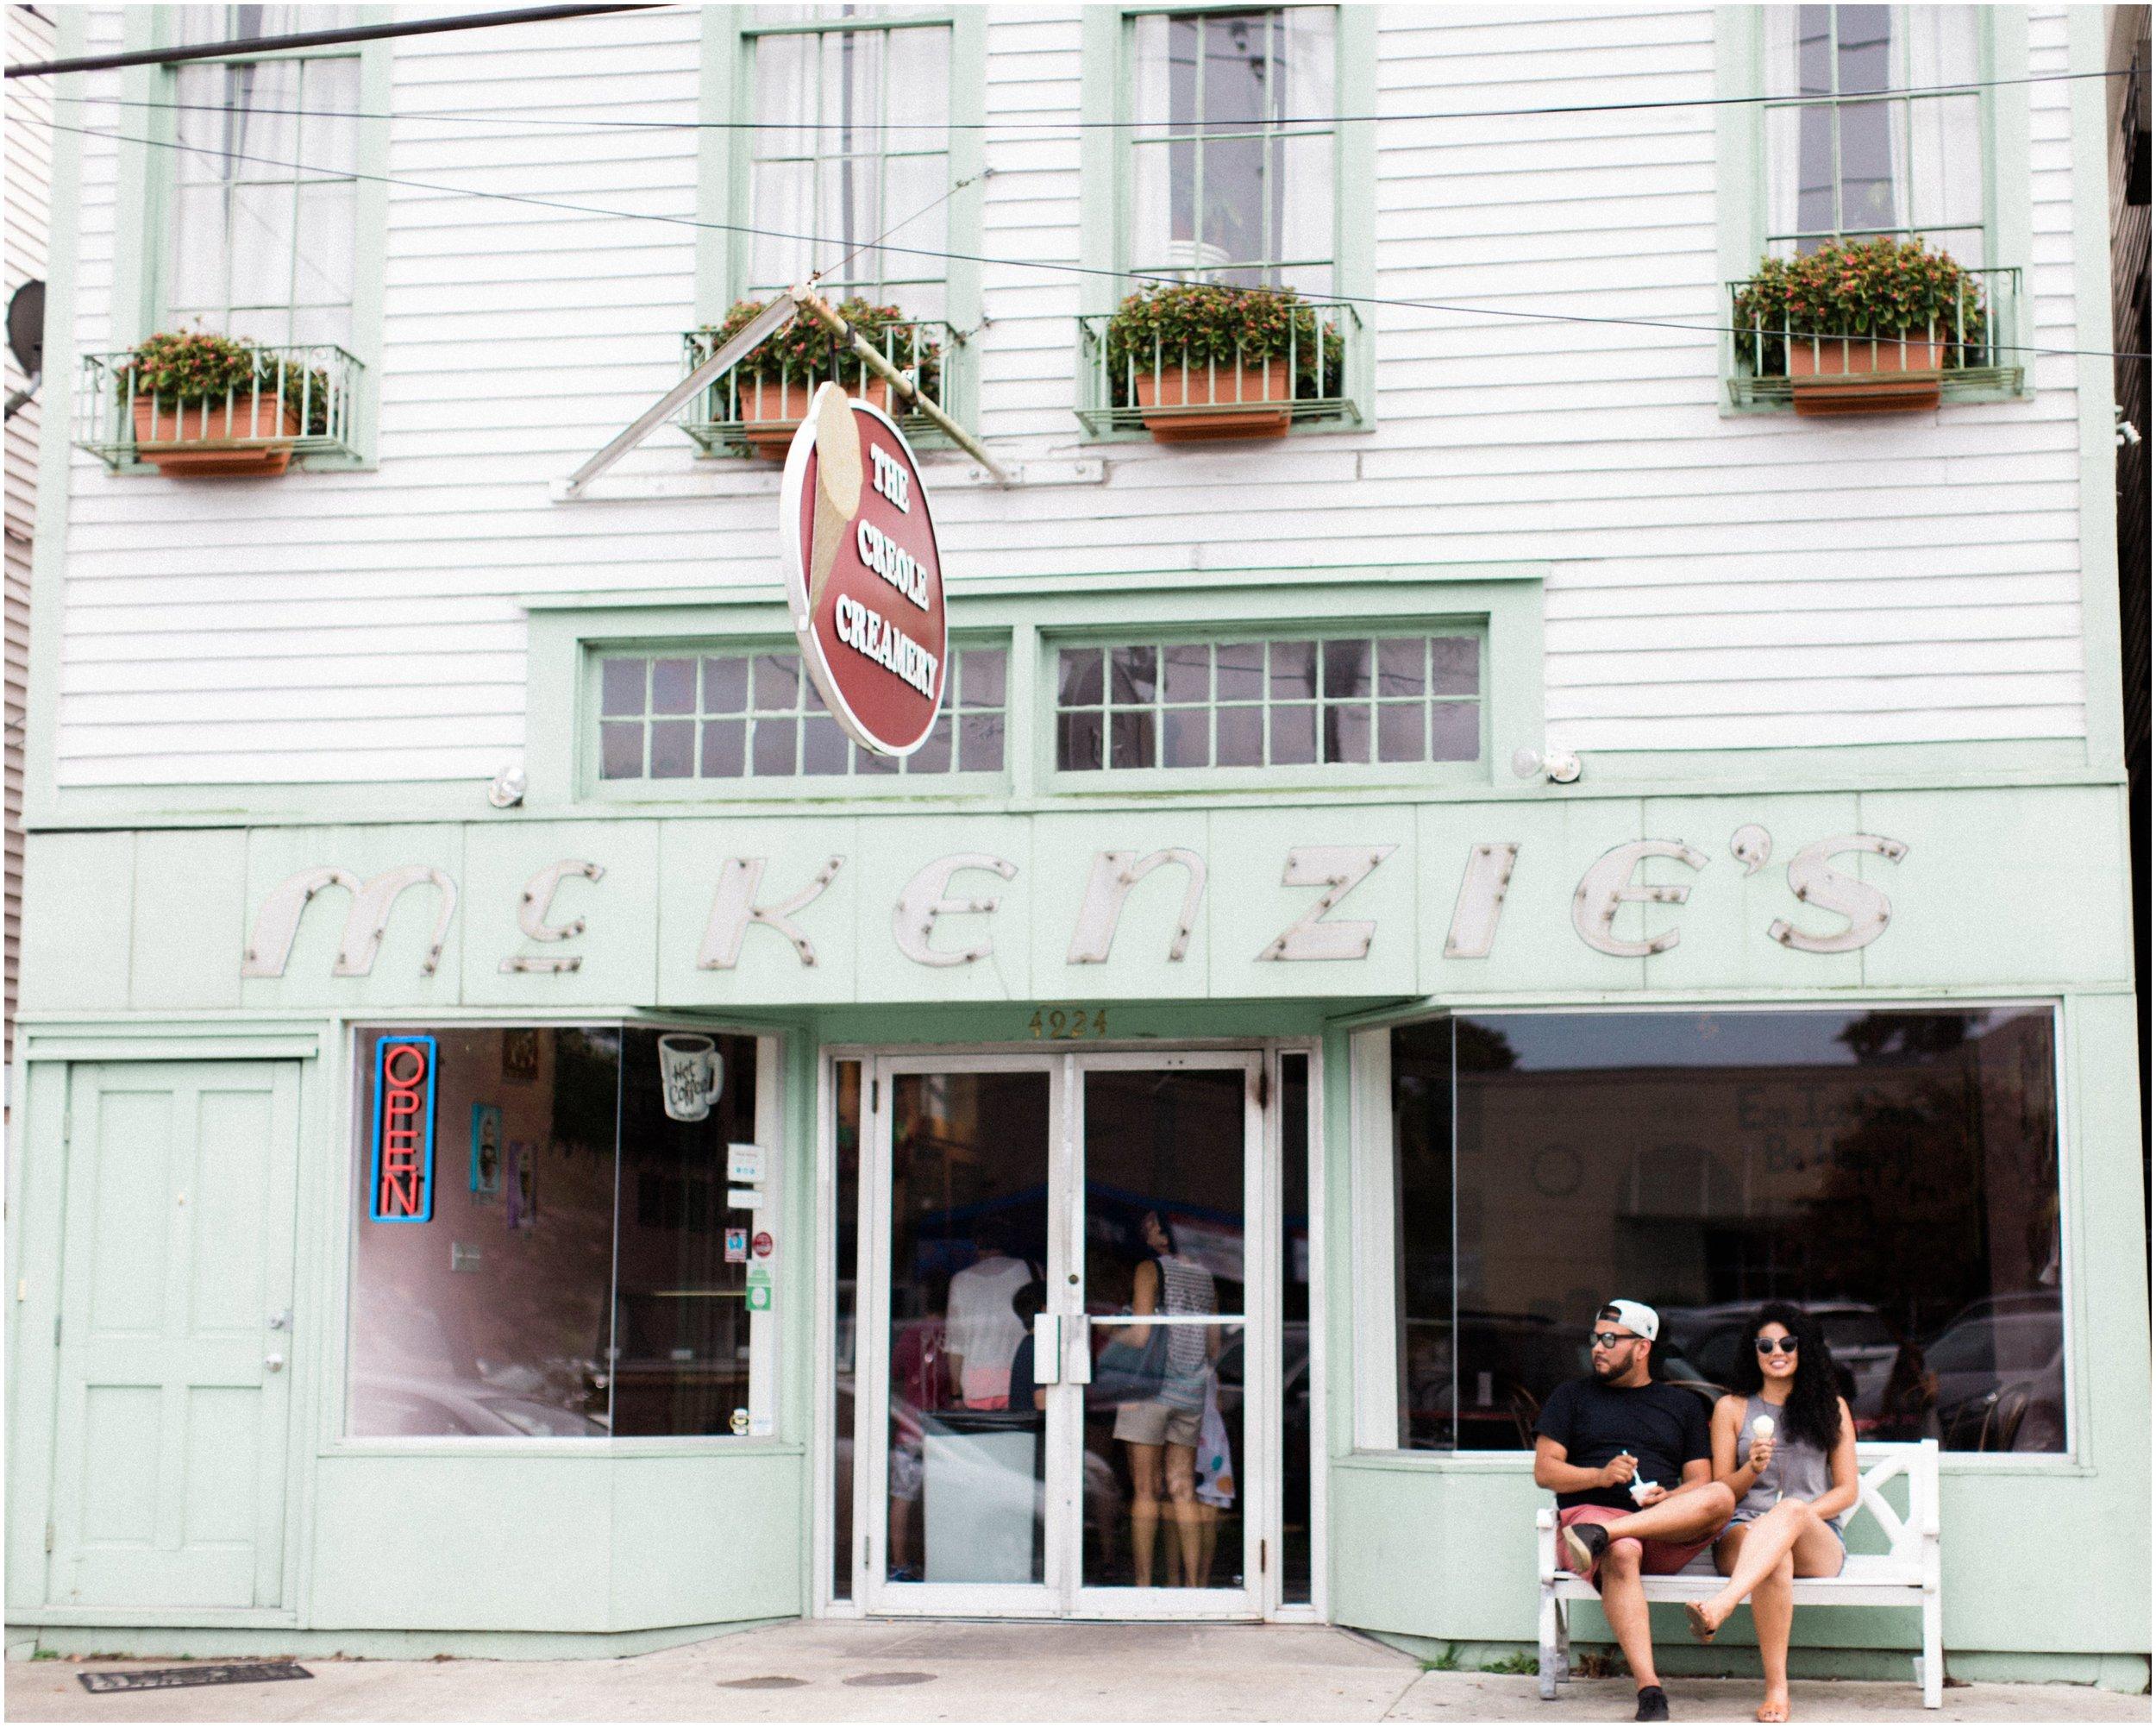 quaint-and-whim-new-orleans-lifestyle-anniversary-photo-22.jpg